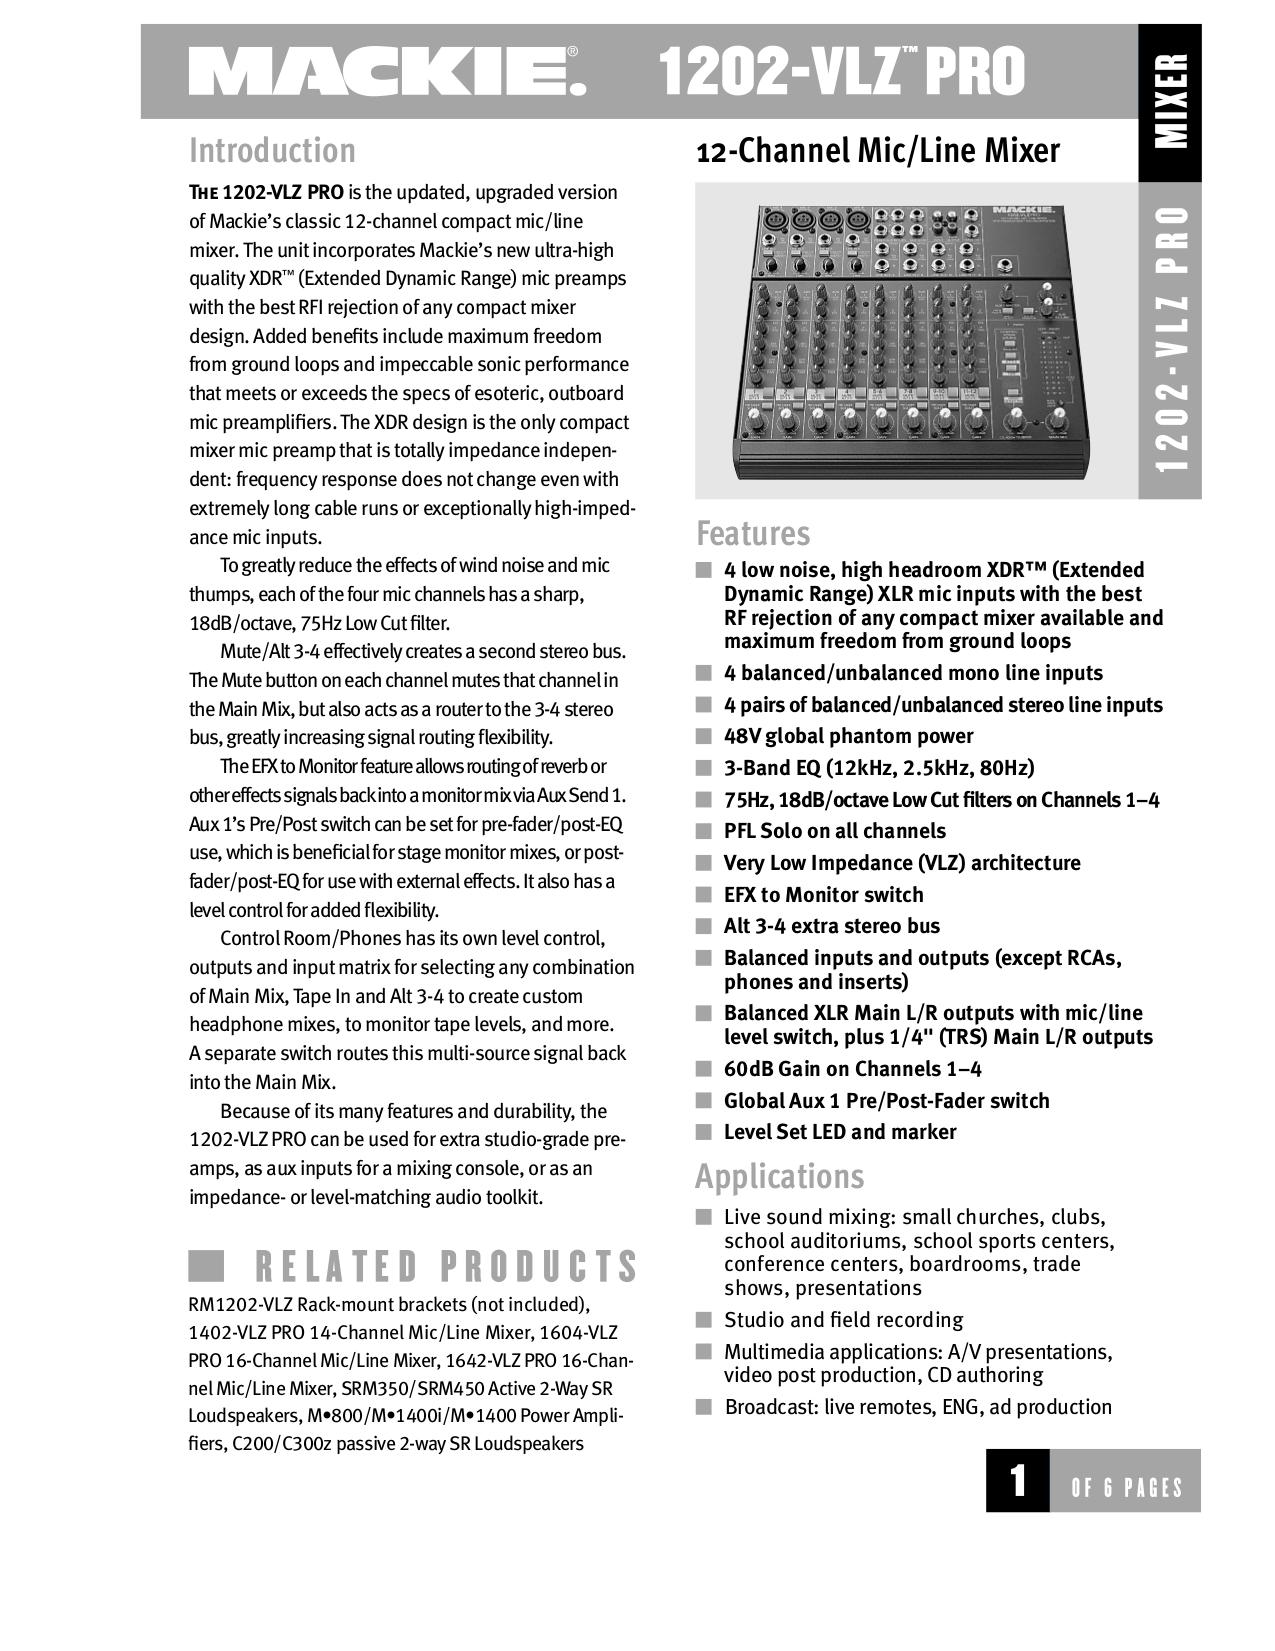 download free pdf for mackie 1604 vlz pro line mixer other manual rh umlib com mackie 1604-vlz pro manual download mackie 1604-vlz pro manual download